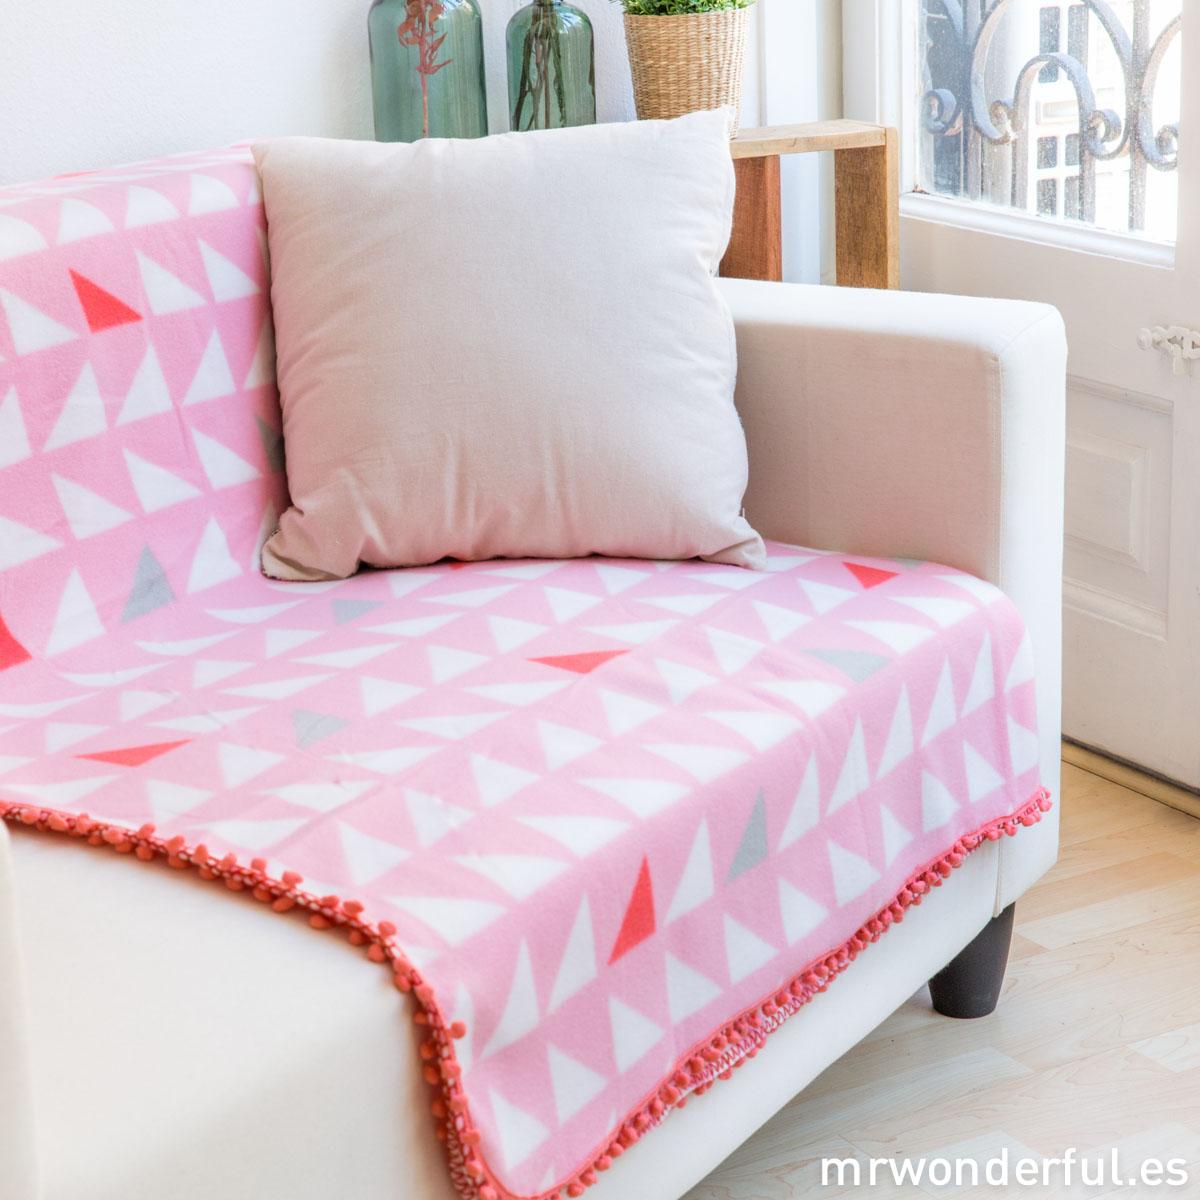 mrwonderful_PT2448_manta-rosa-triangulos-borlas-rosa-pastel-17-Editar